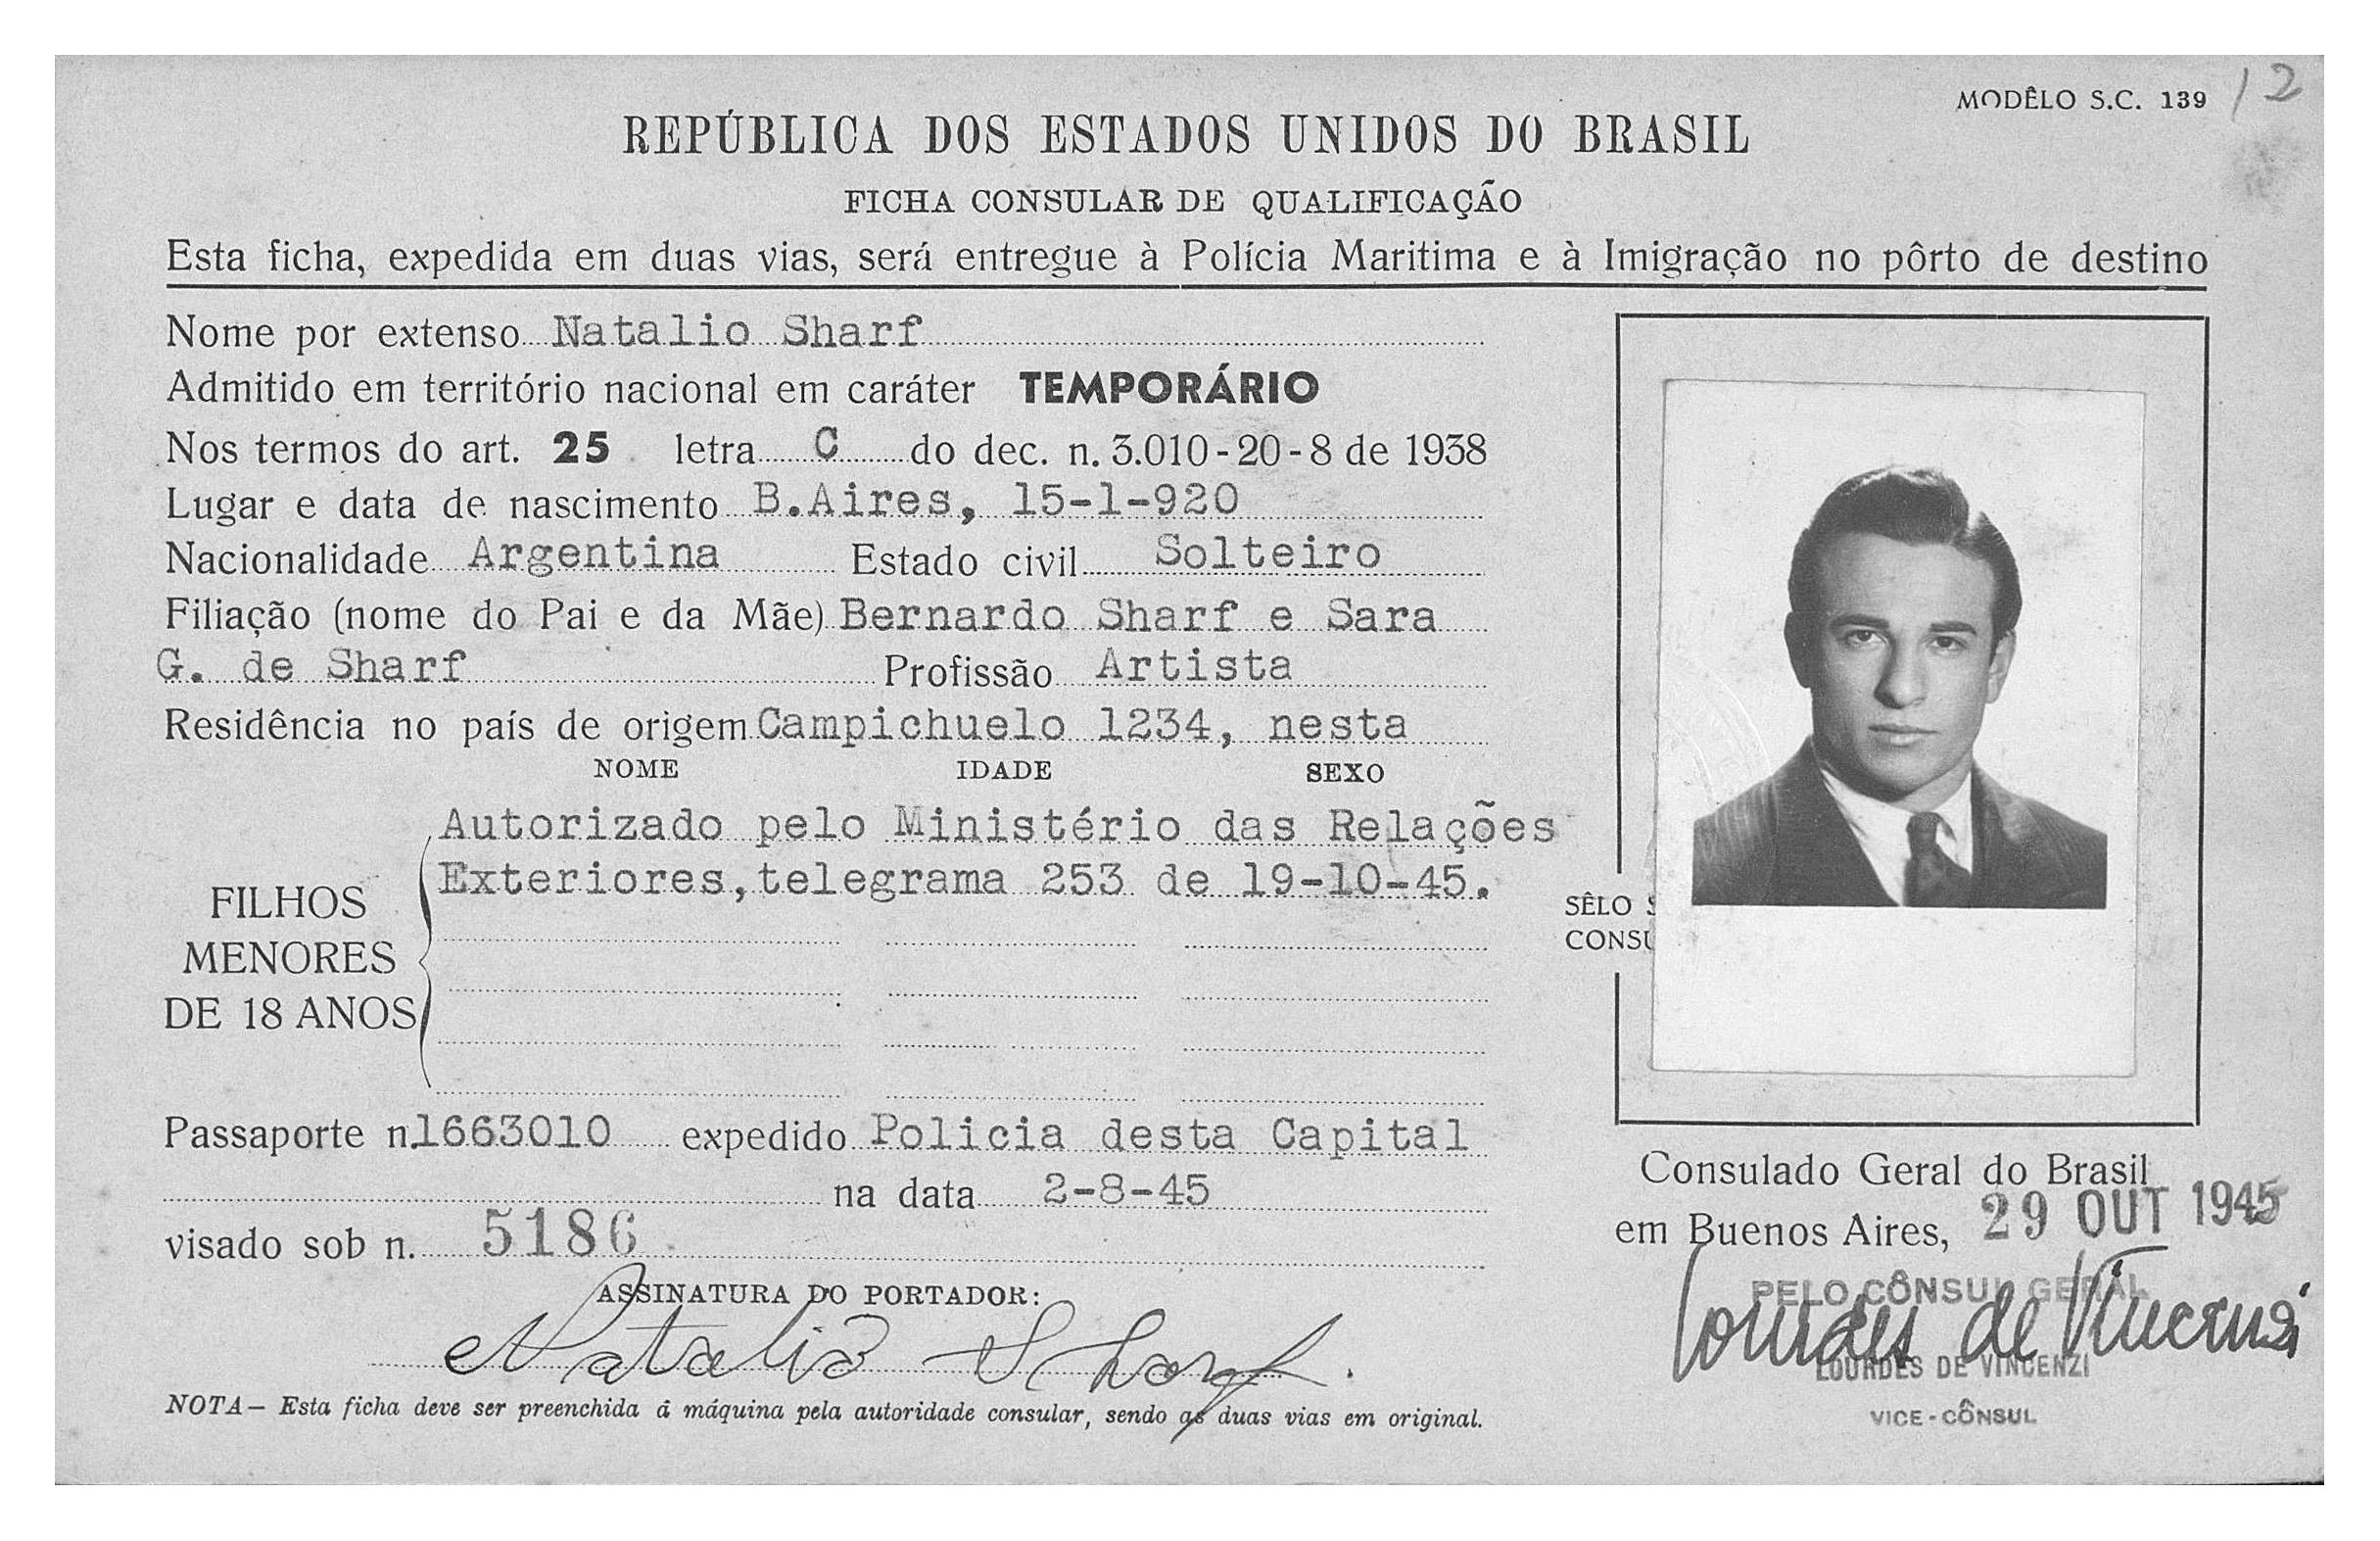 1945-10 - ficha consular - RJ - 01 copy